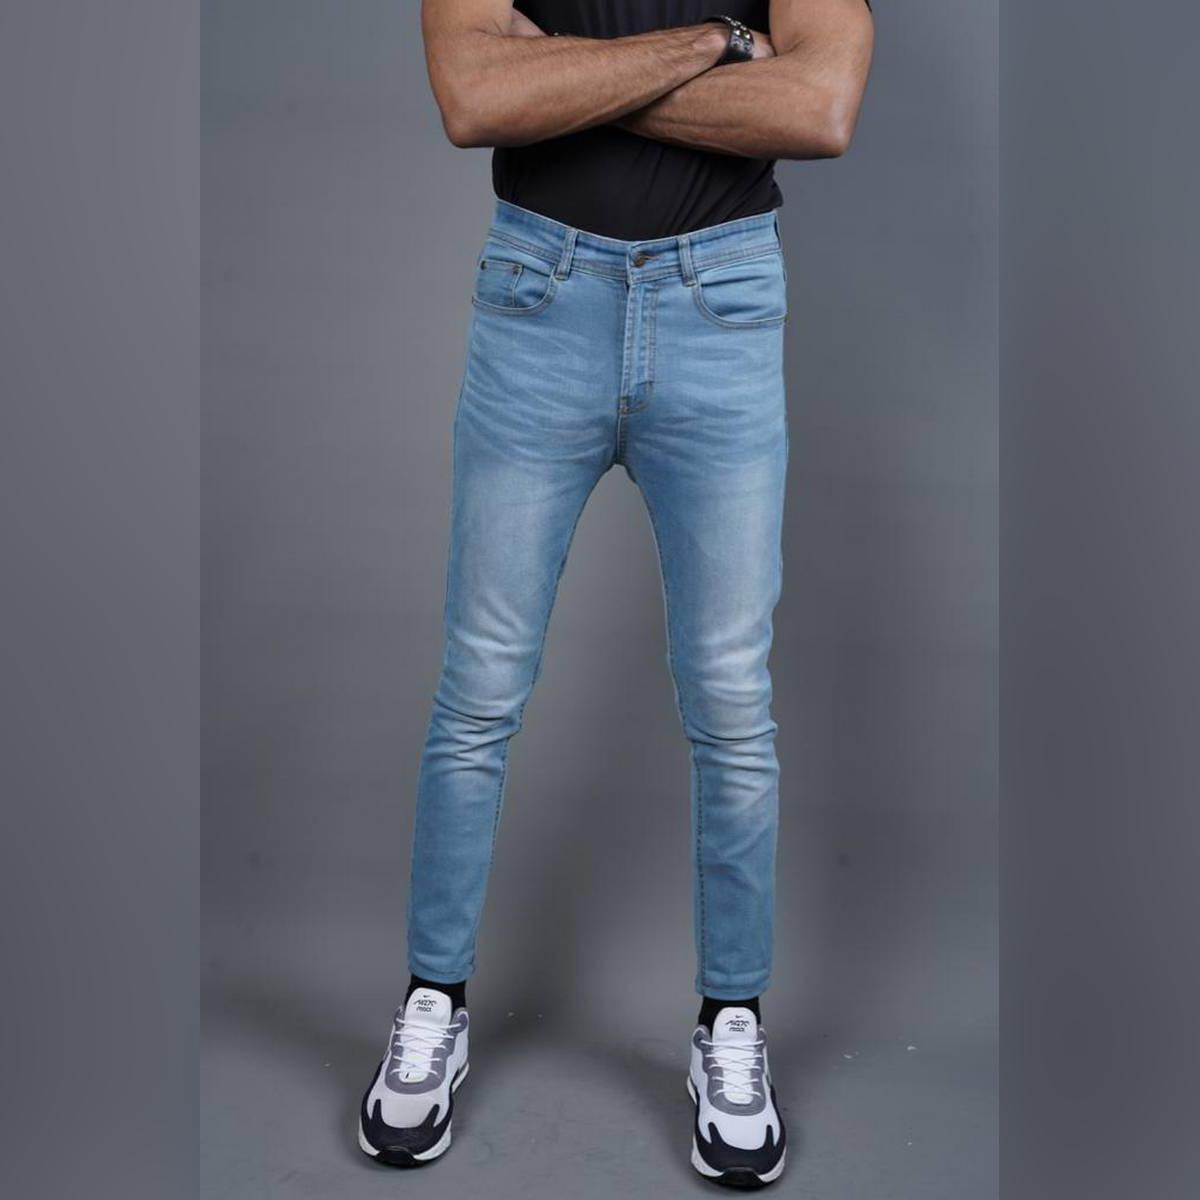 Men's Slim Fit Jeans - Light Blue